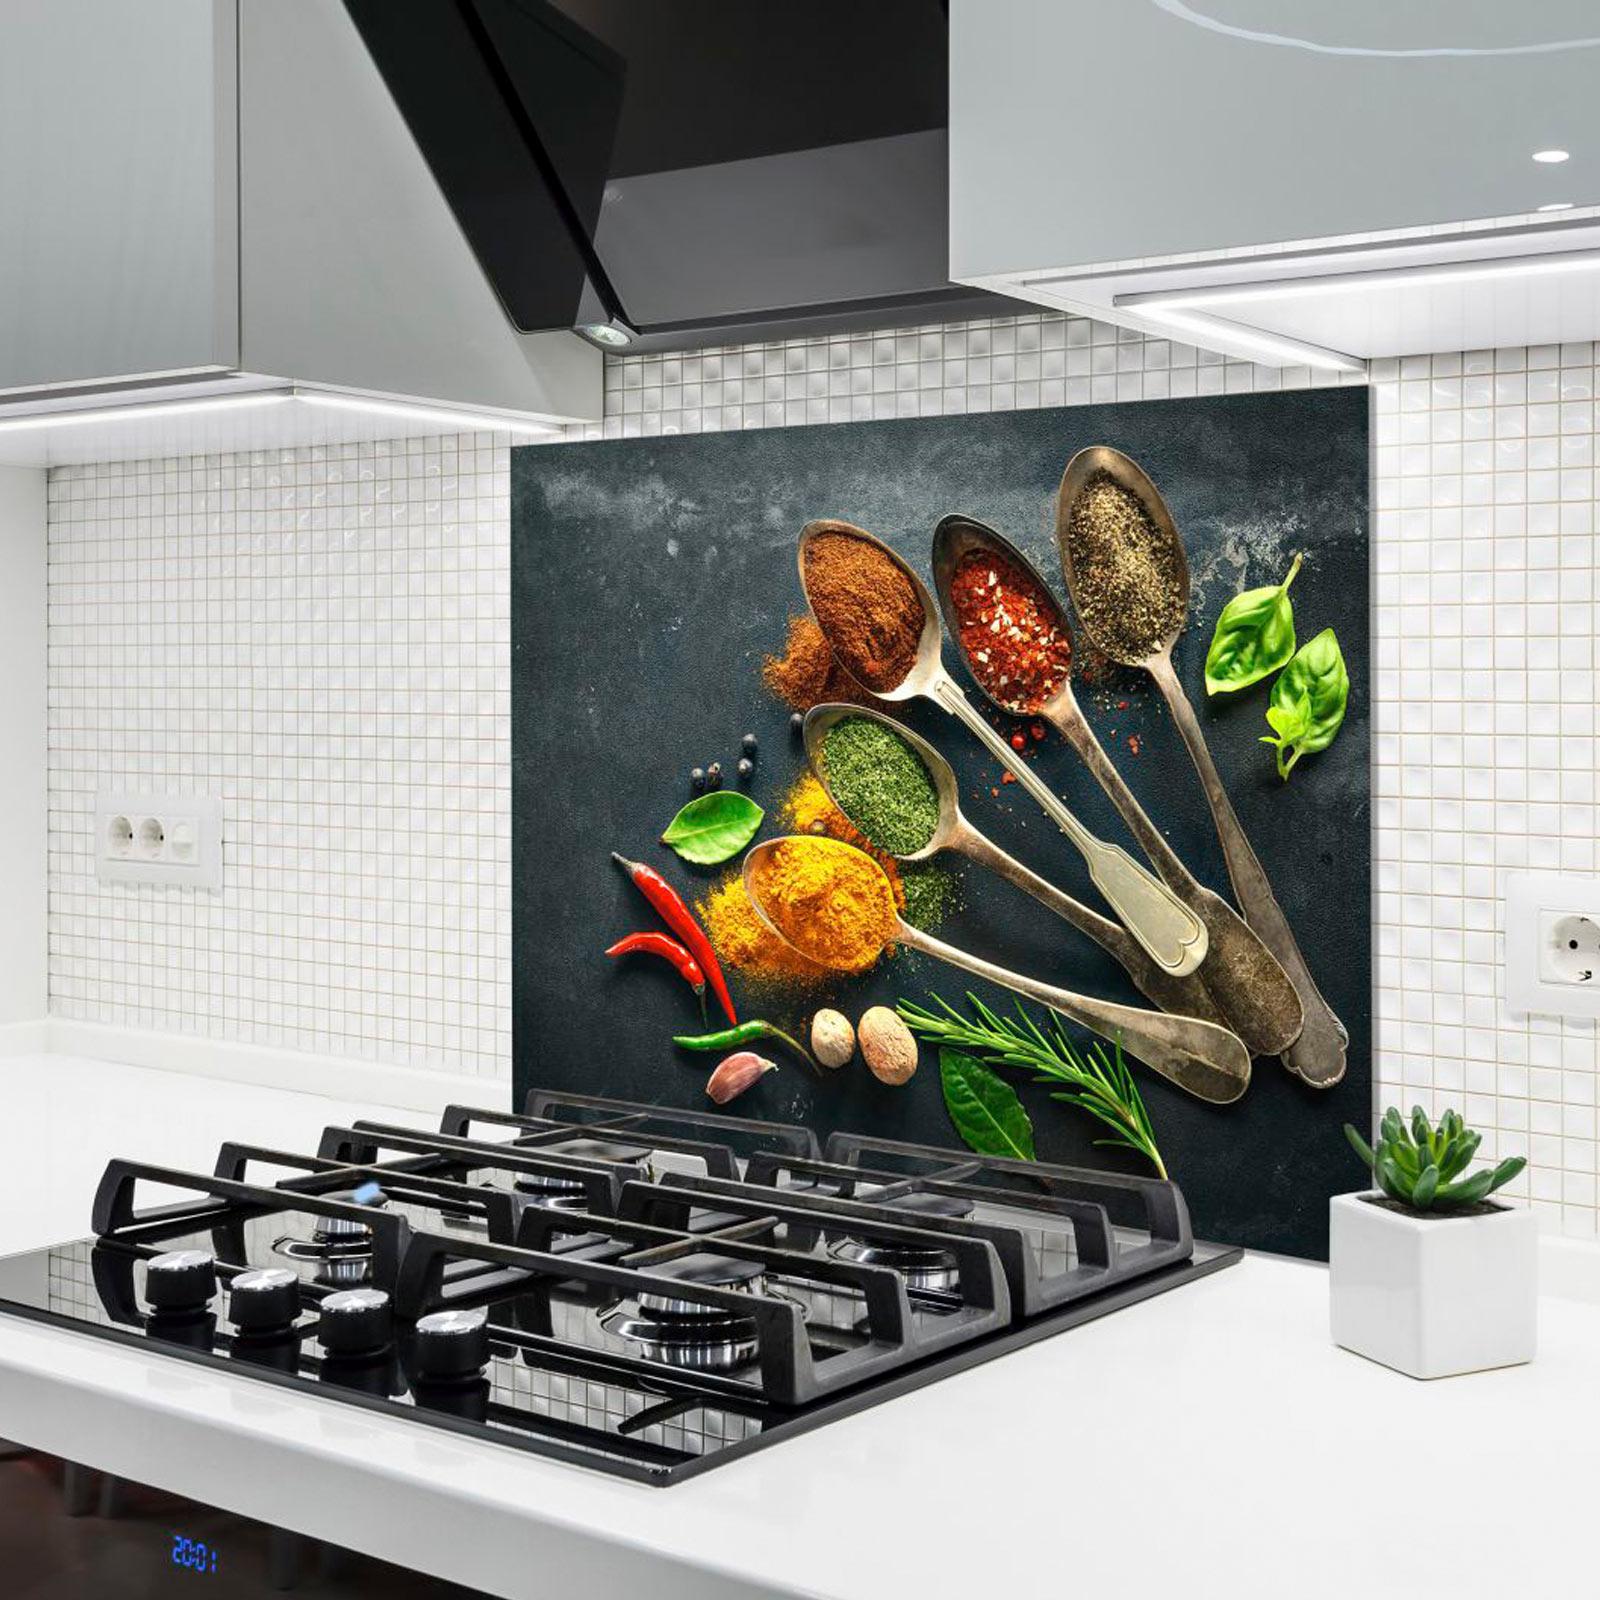 Küchenrückwand aus Glas - Gewürze - 90x65 cm